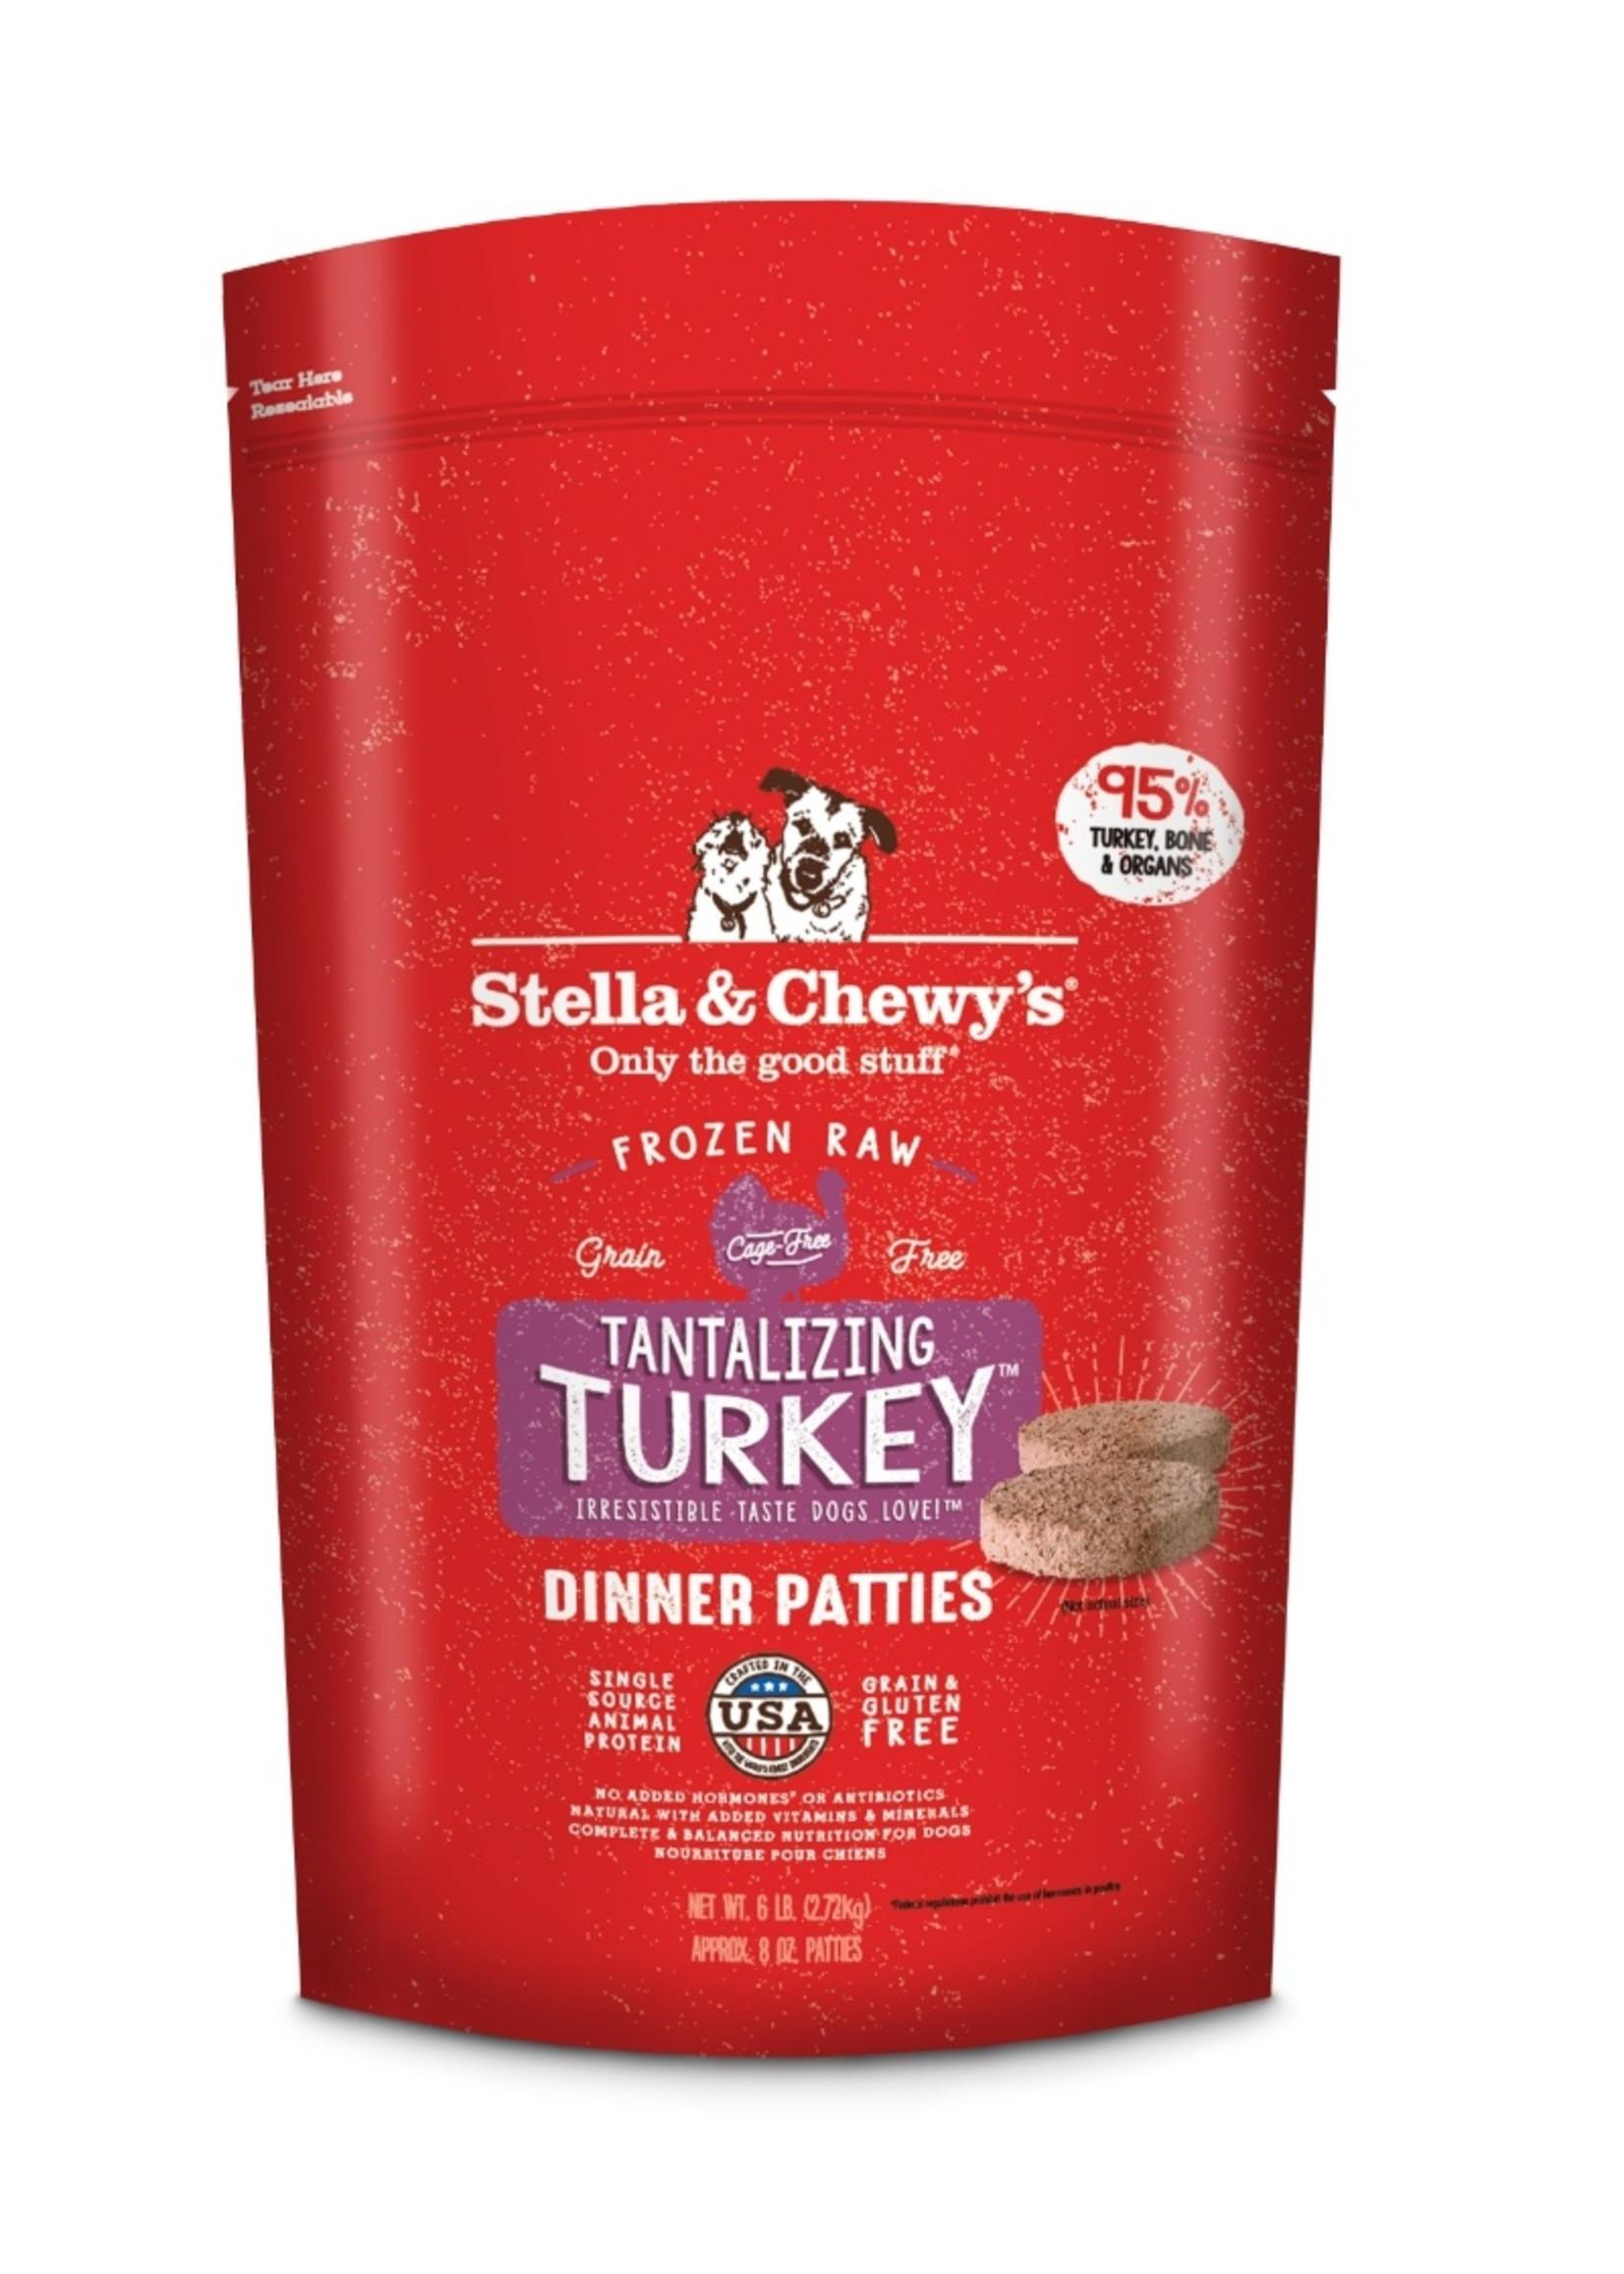 STELLA & CHEWY'S Stella & Chewy's Tantalizing Turkey